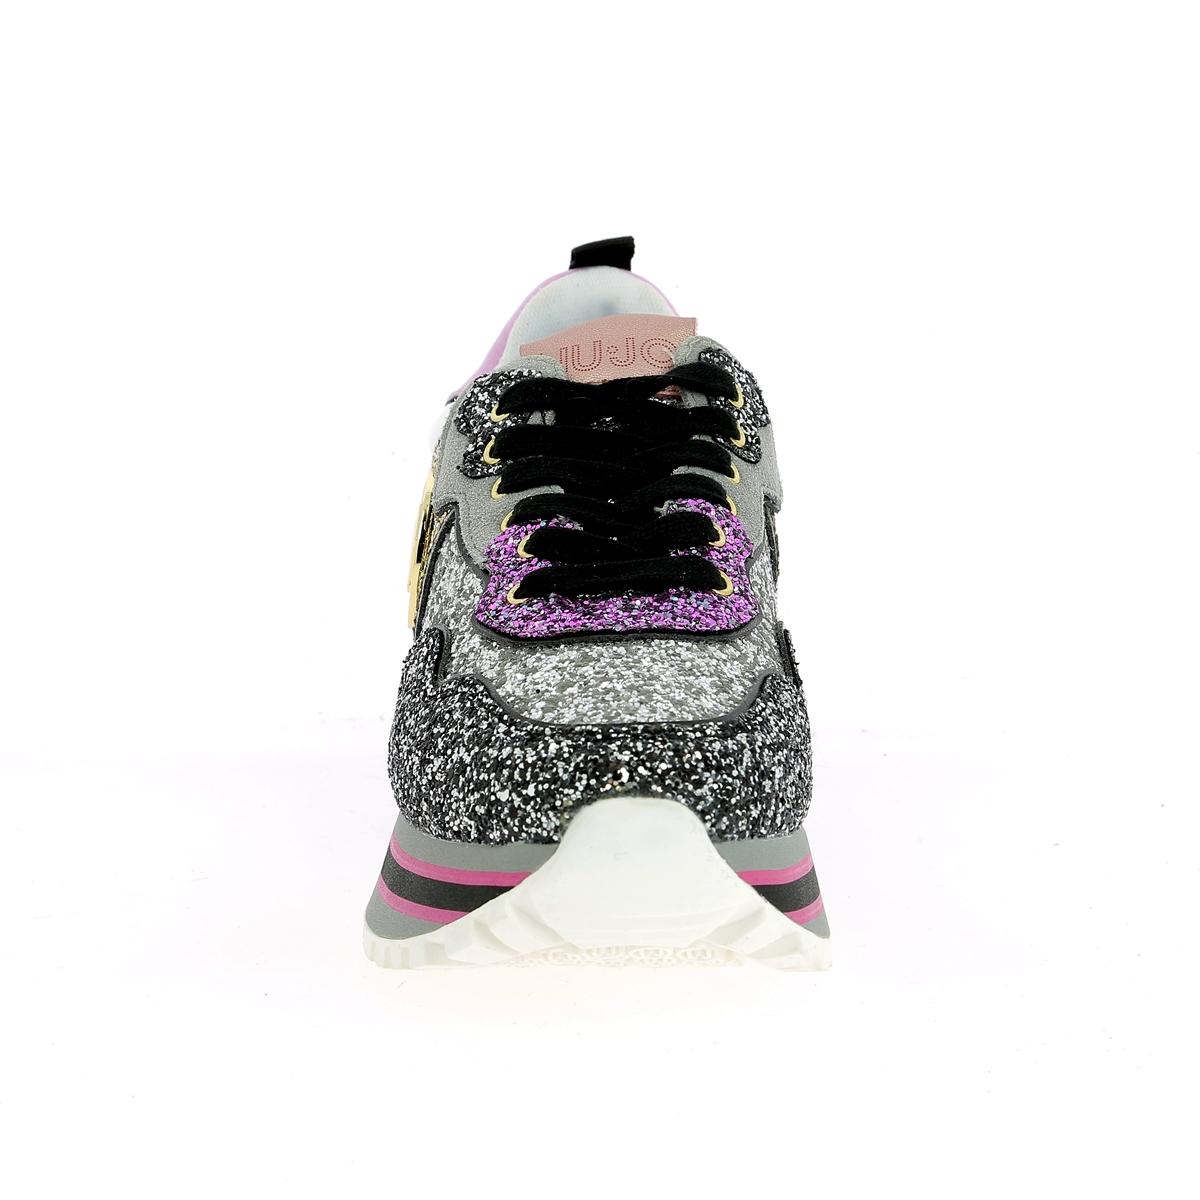 Liu Jo Sneakers multi